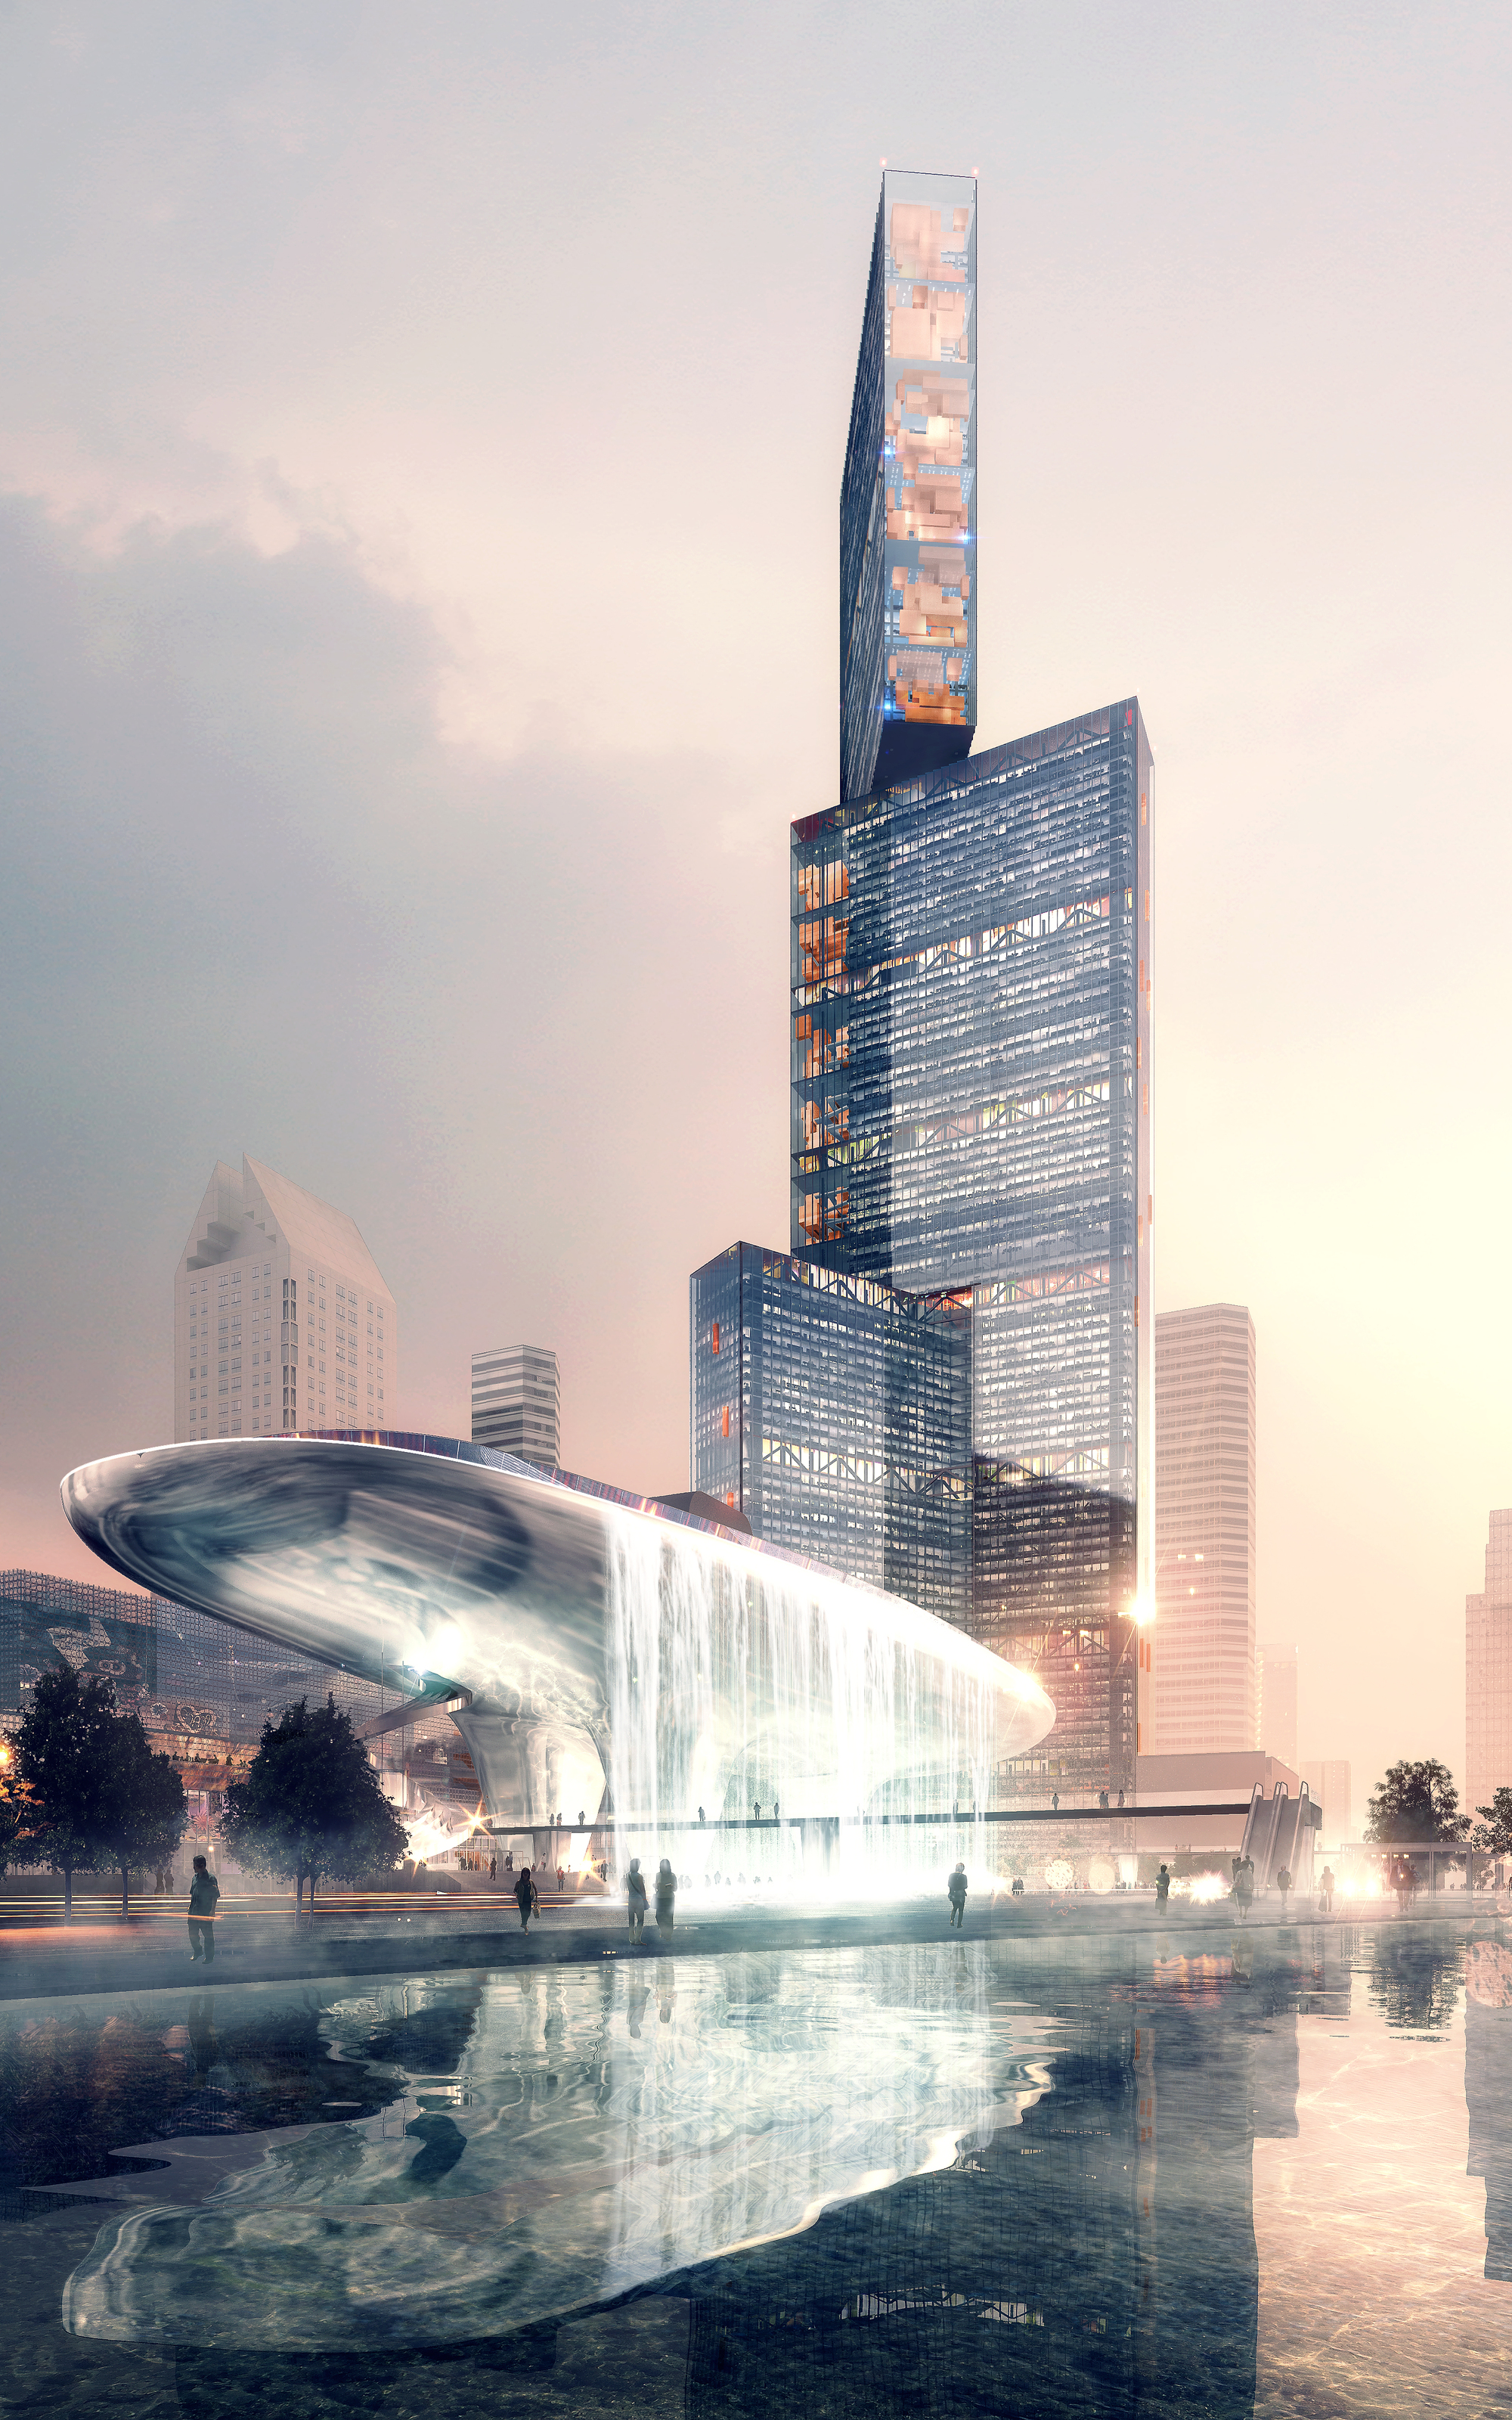 Plp unveils pearl river delta 39 s tallest building as part for Delta v architecture